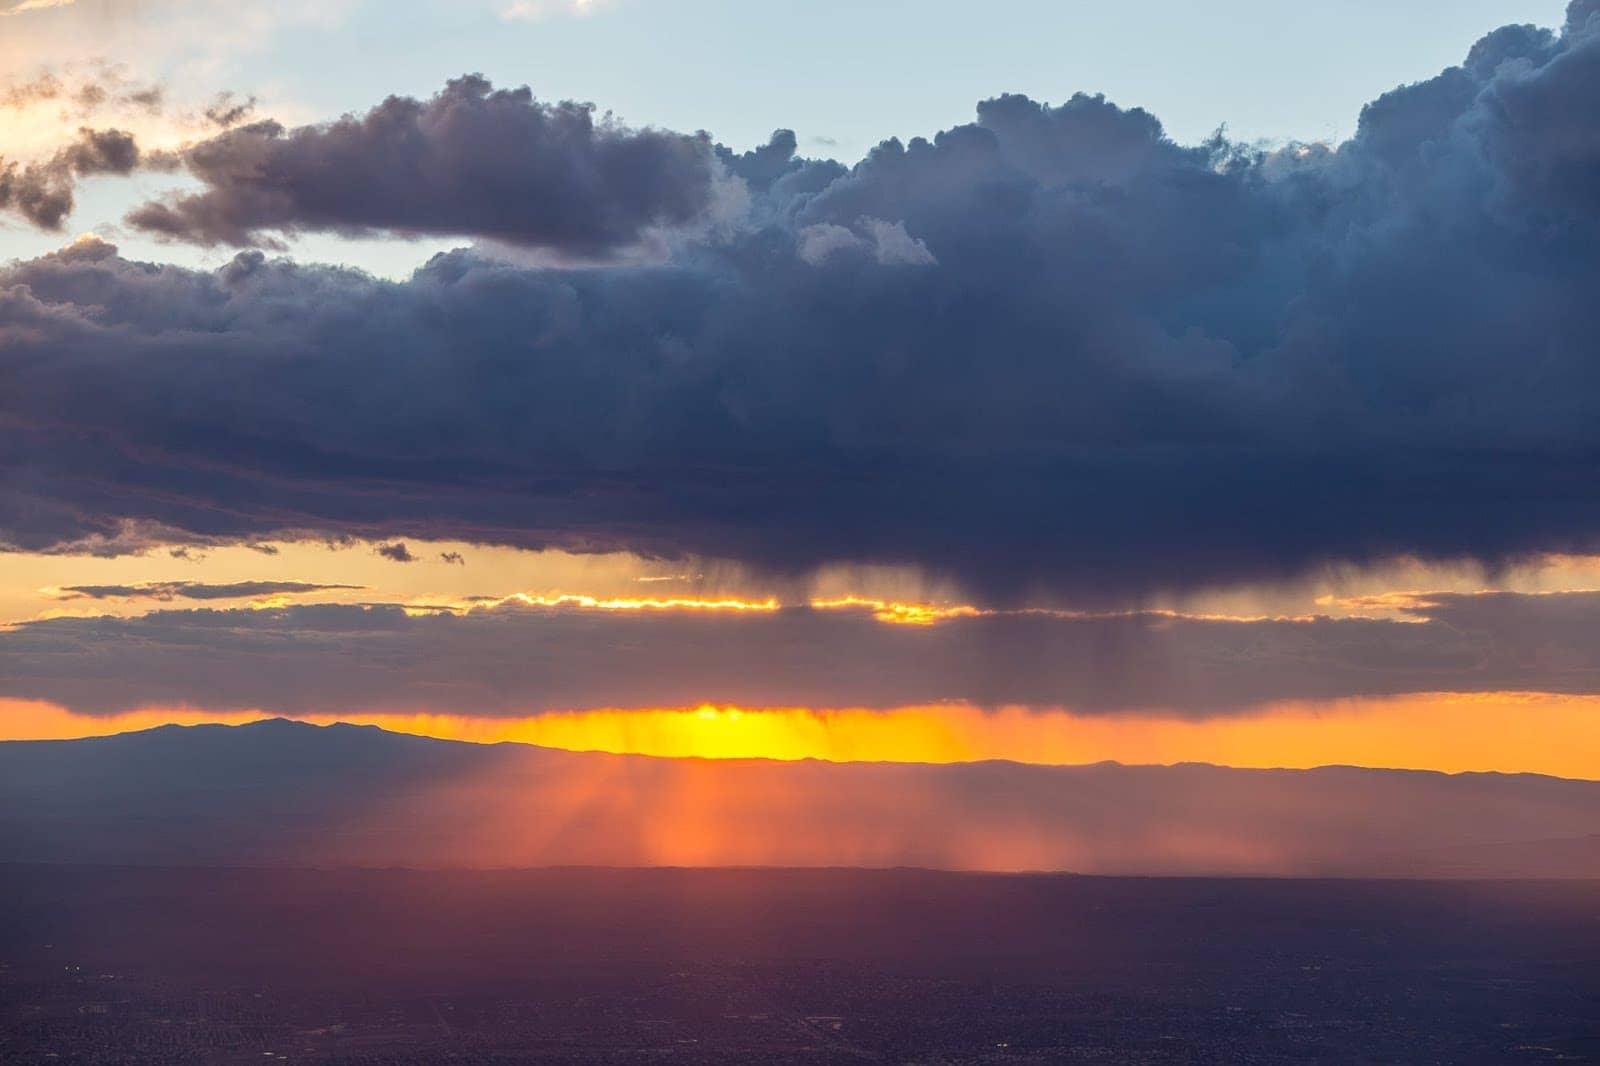 Sandia Peak Sunset Albuquerque New Mexico_by_Laurence Norah-3